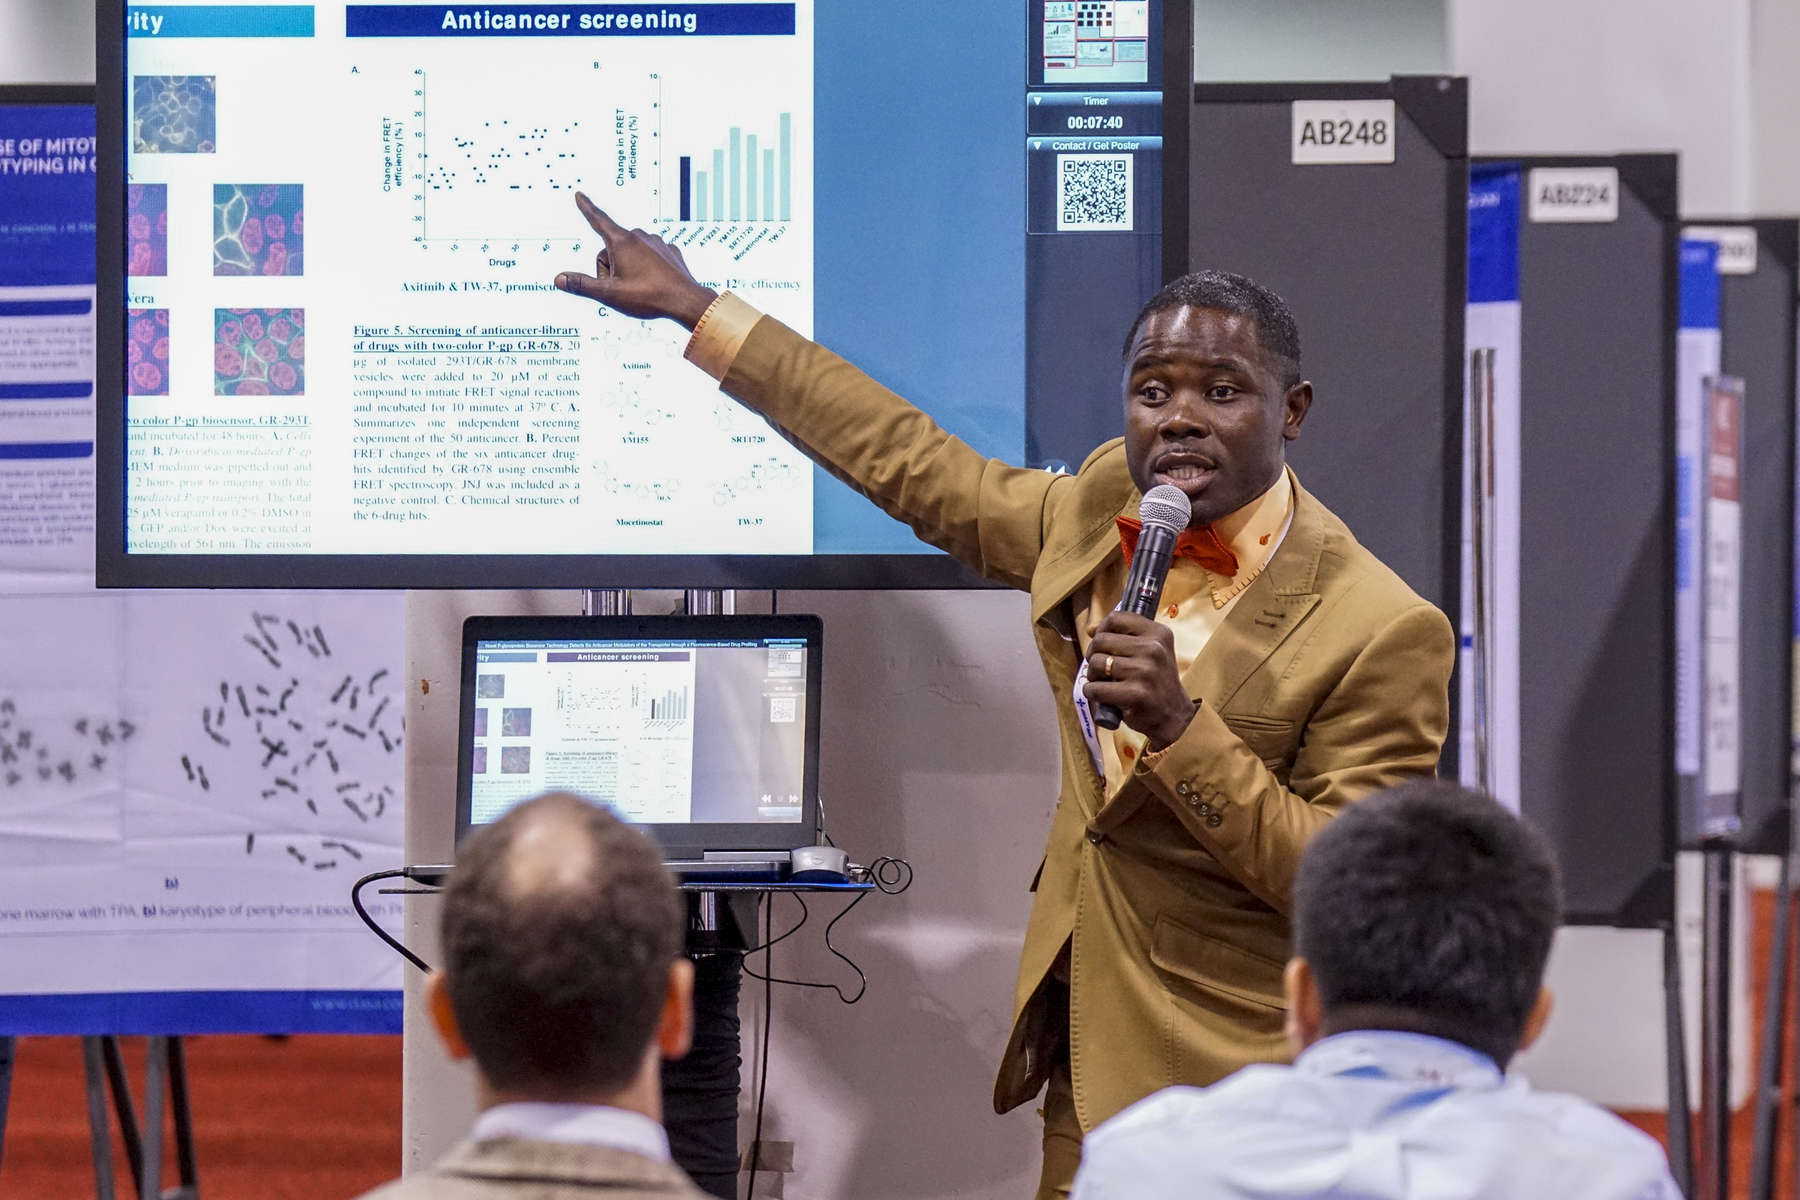 Bremansu Osa-Andrews presents his ePoster in the exhibit hall.